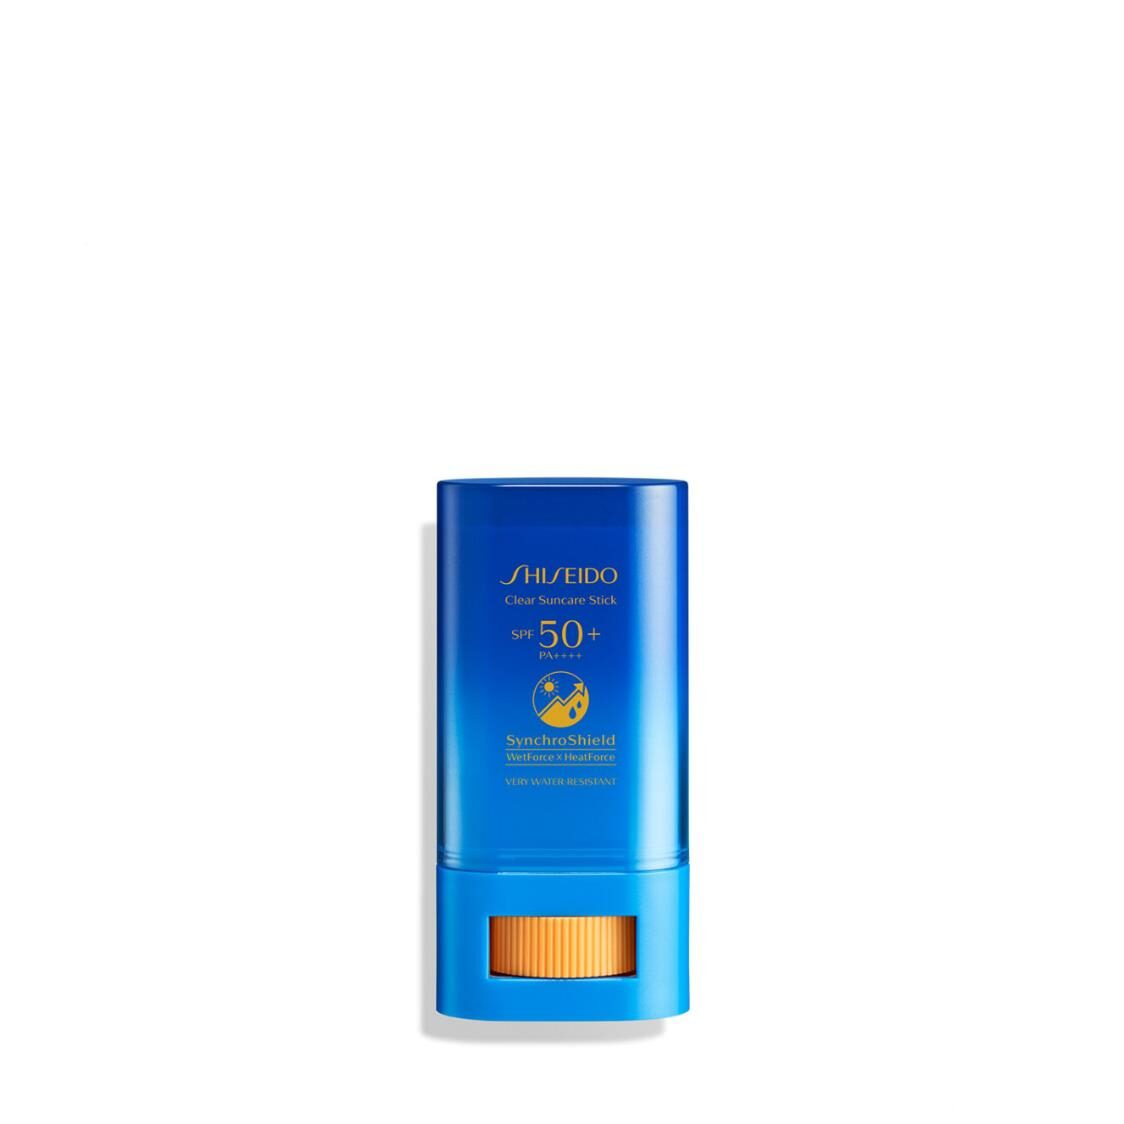 Shiseido Clear Suncare Stick SPF 50 PA